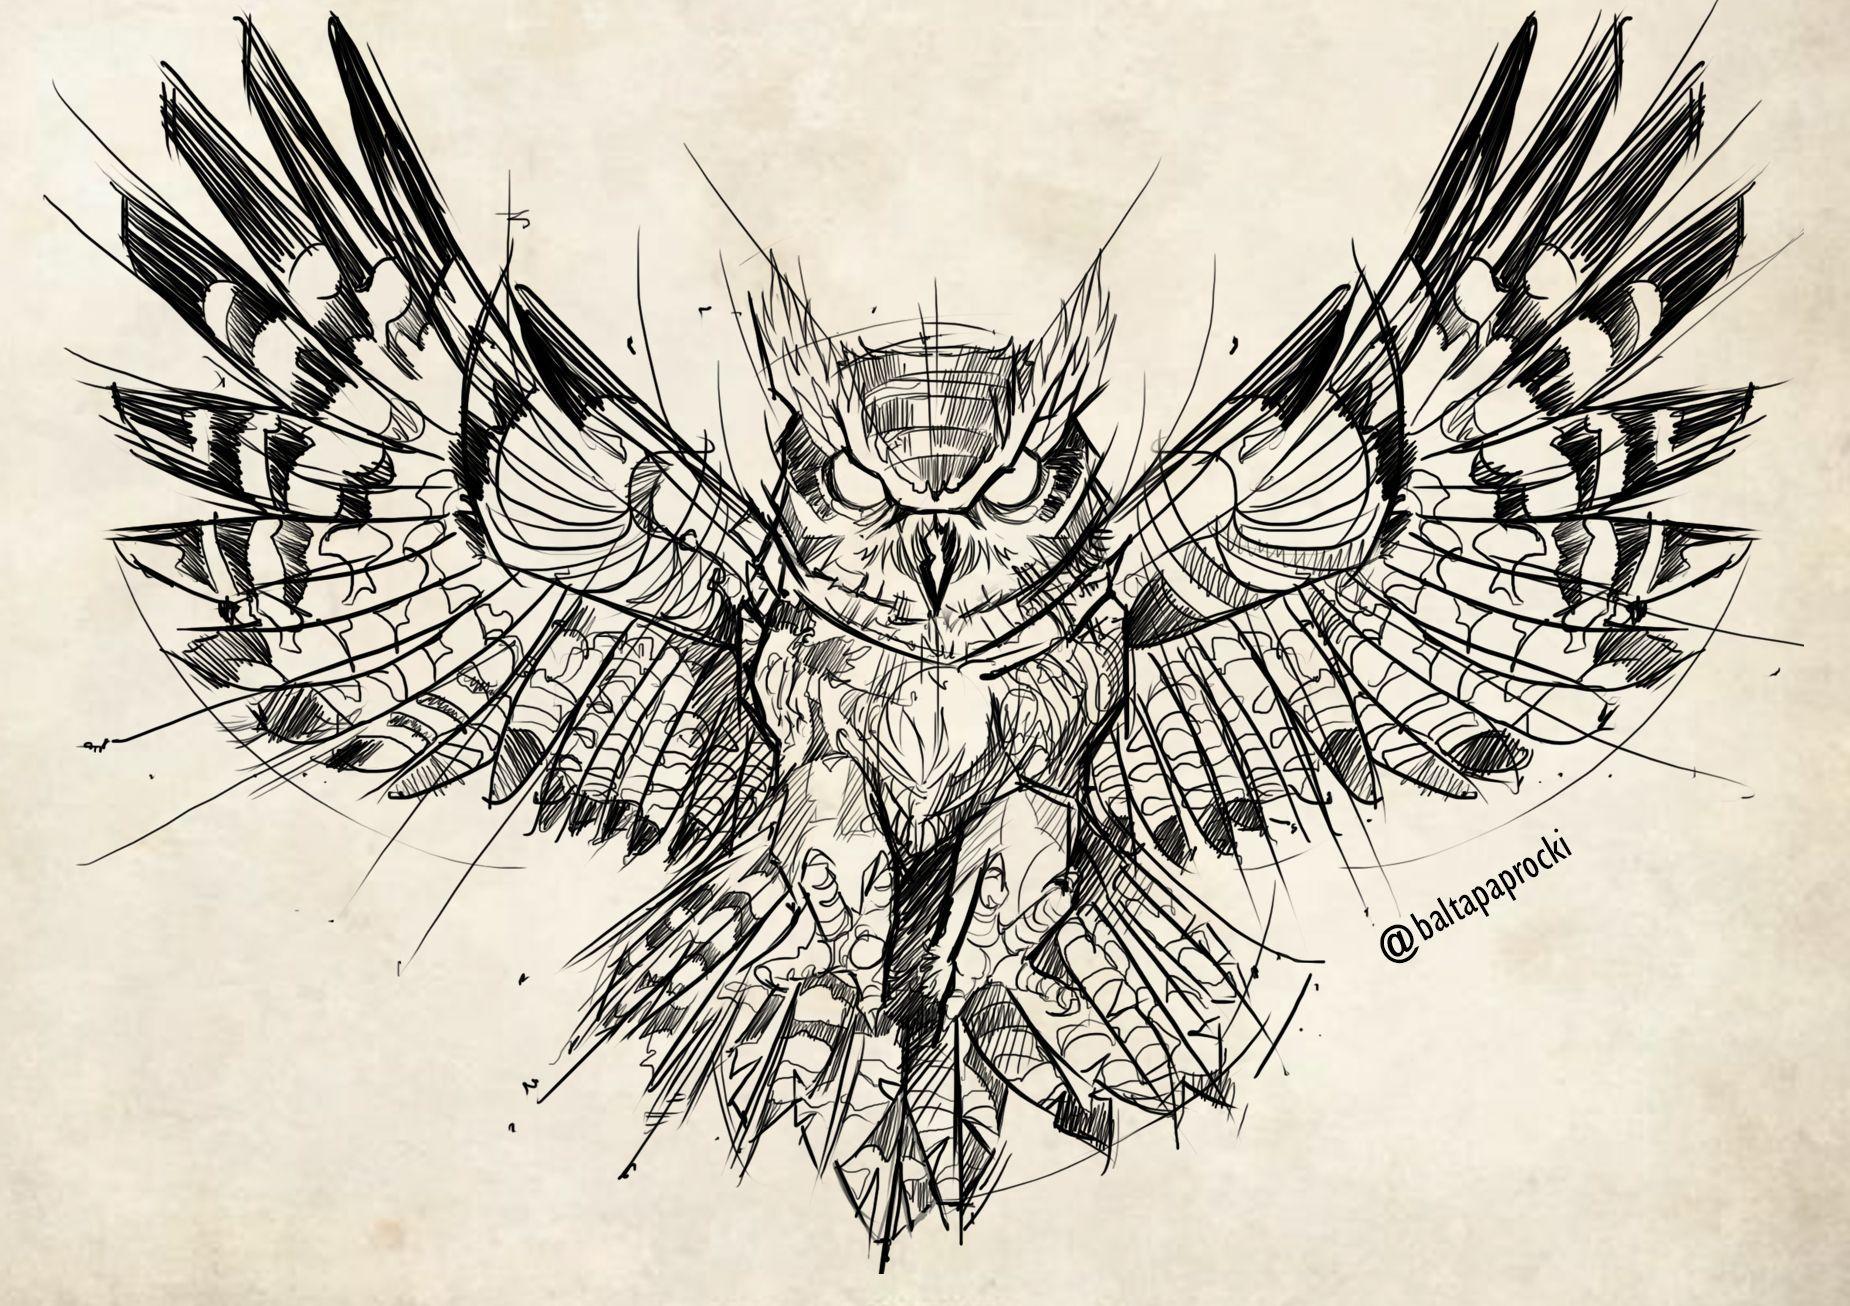 Owl Sketch Owl Tattoo Drawings Owl Sketch Tattoo Drawings